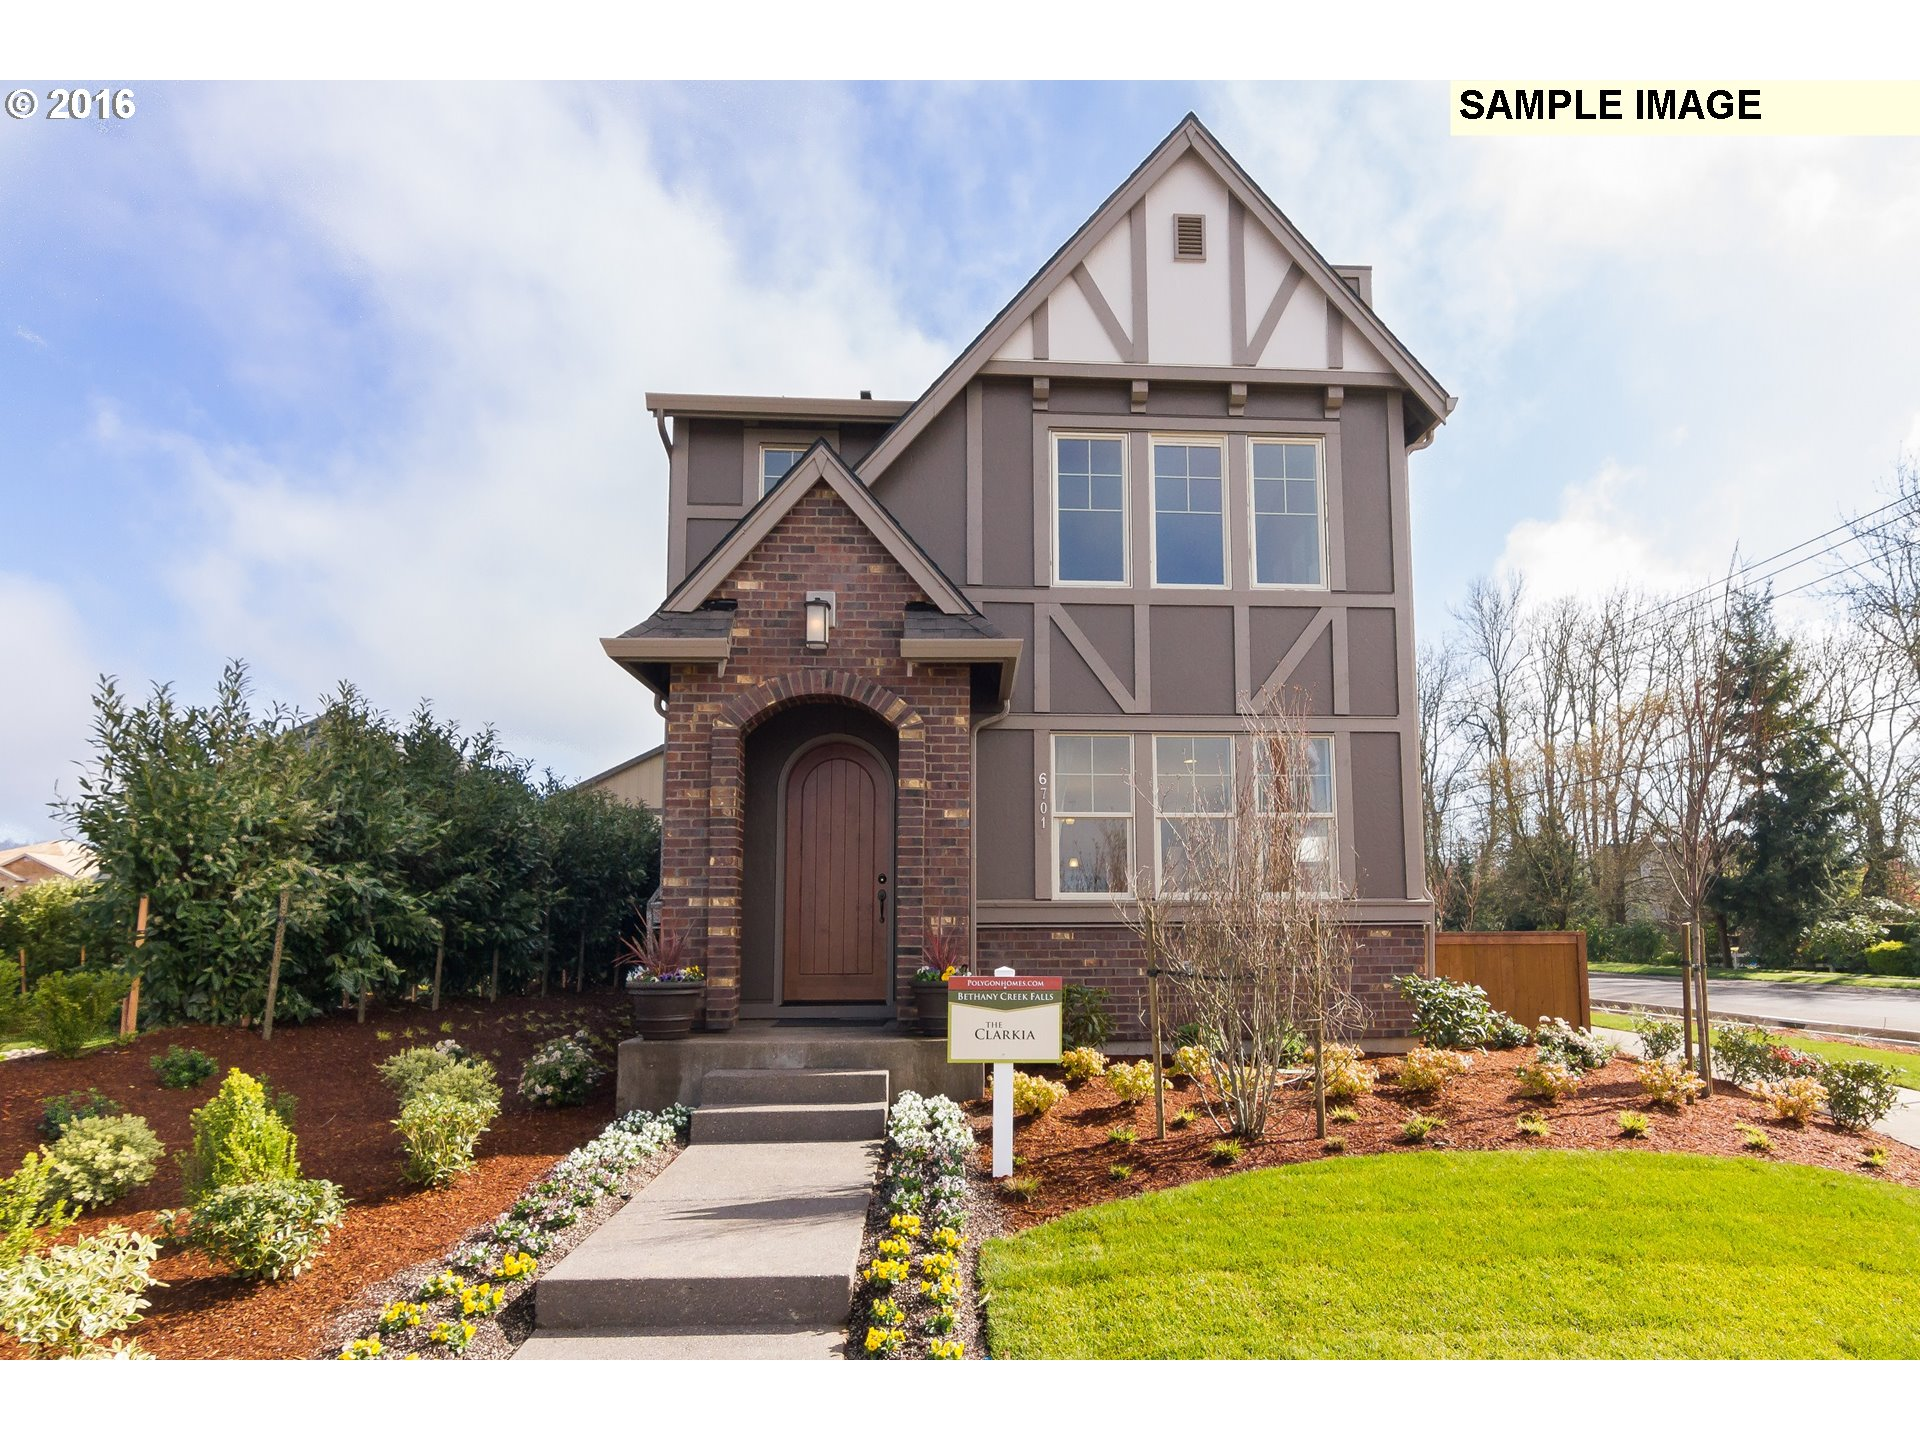 14970 NW Delia ST 303, Portland OR 97229